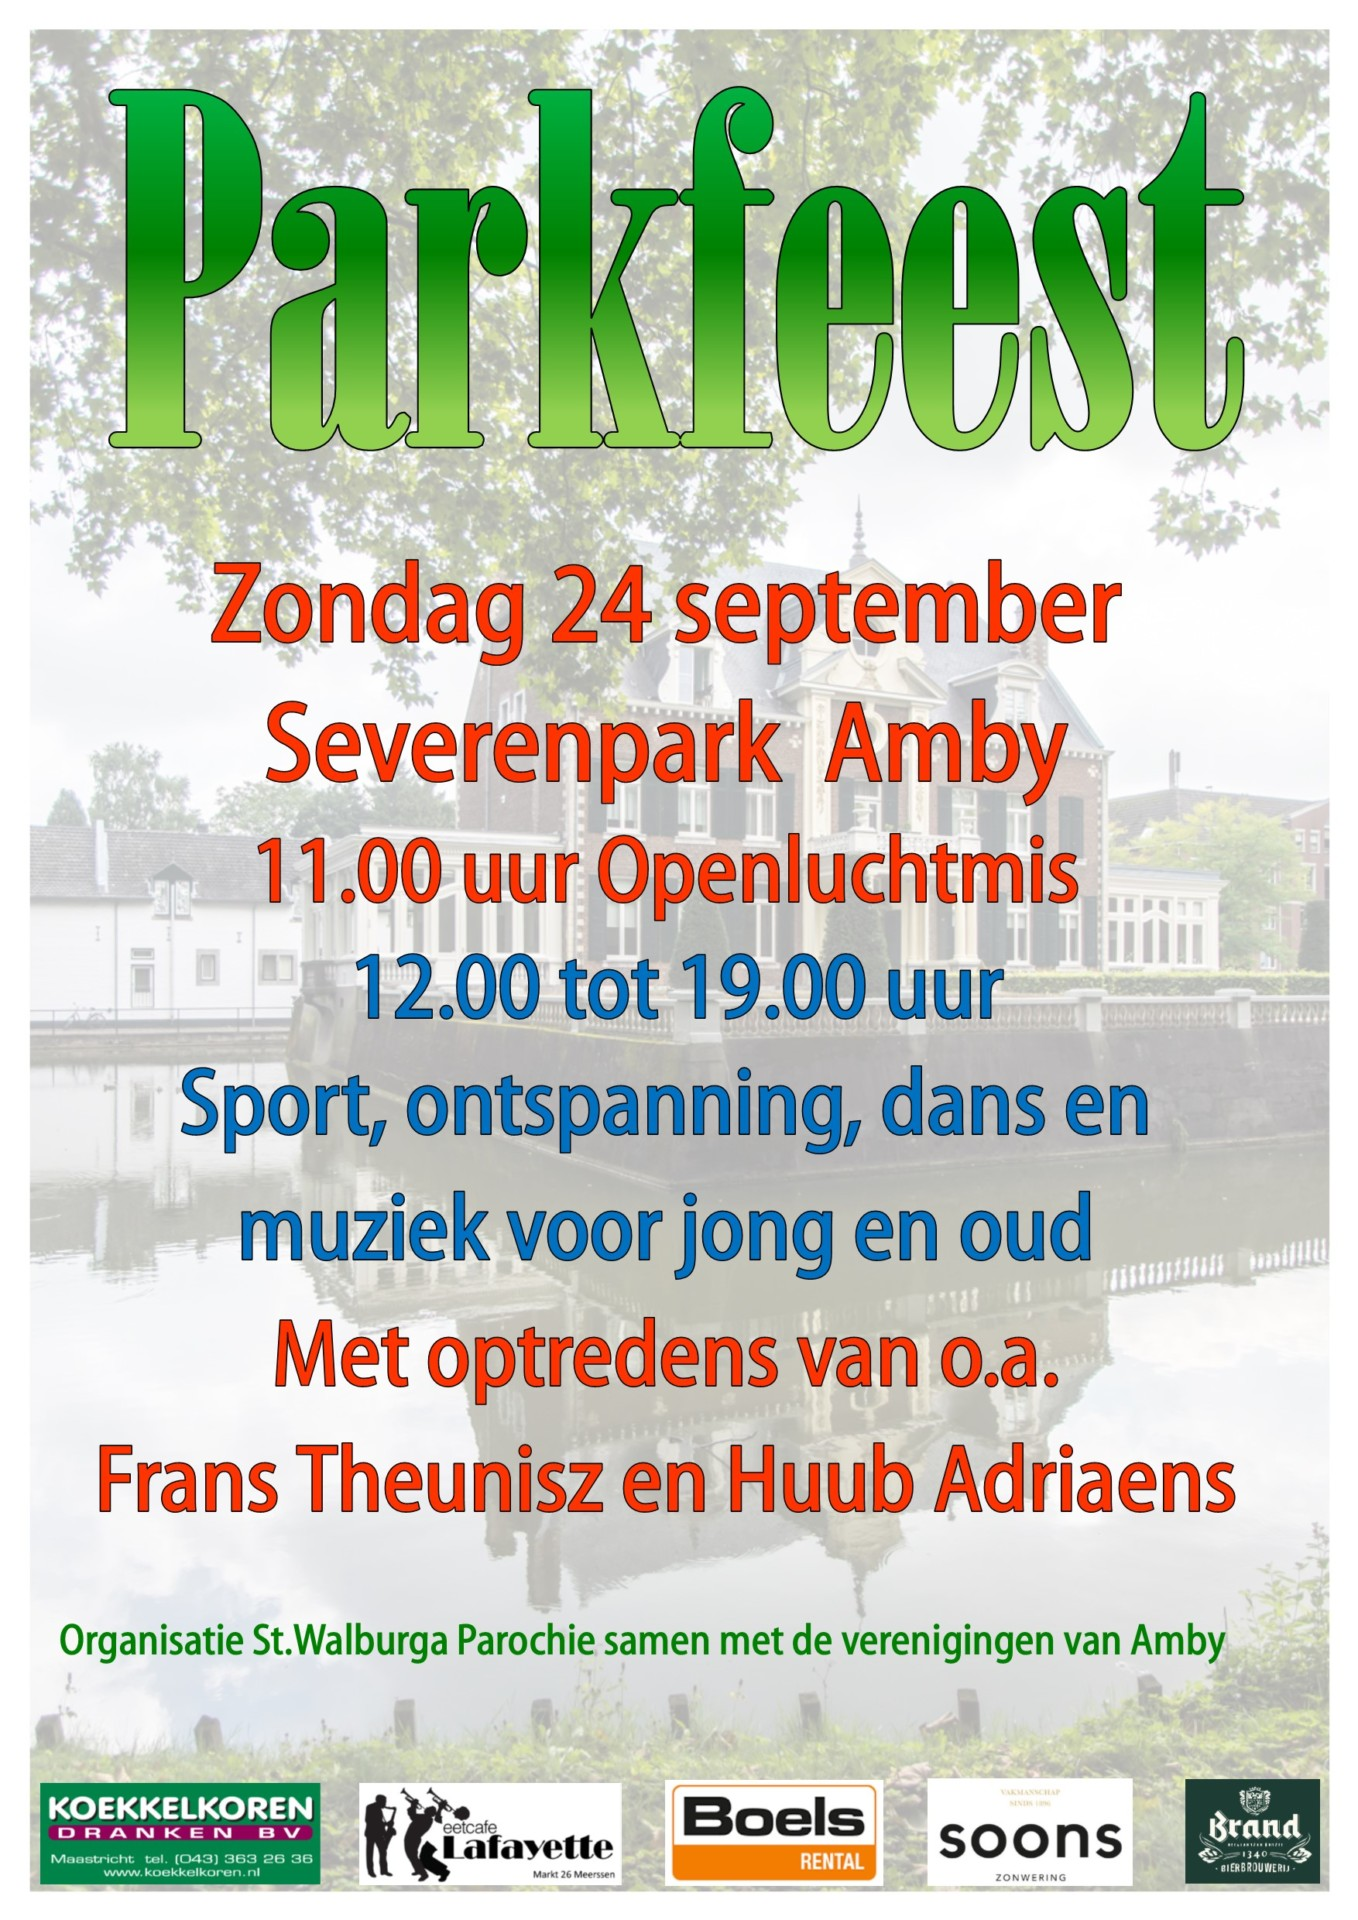 Parkfeest op zondag 24 september Severenpark 11:00 uur tot 19:00 uur